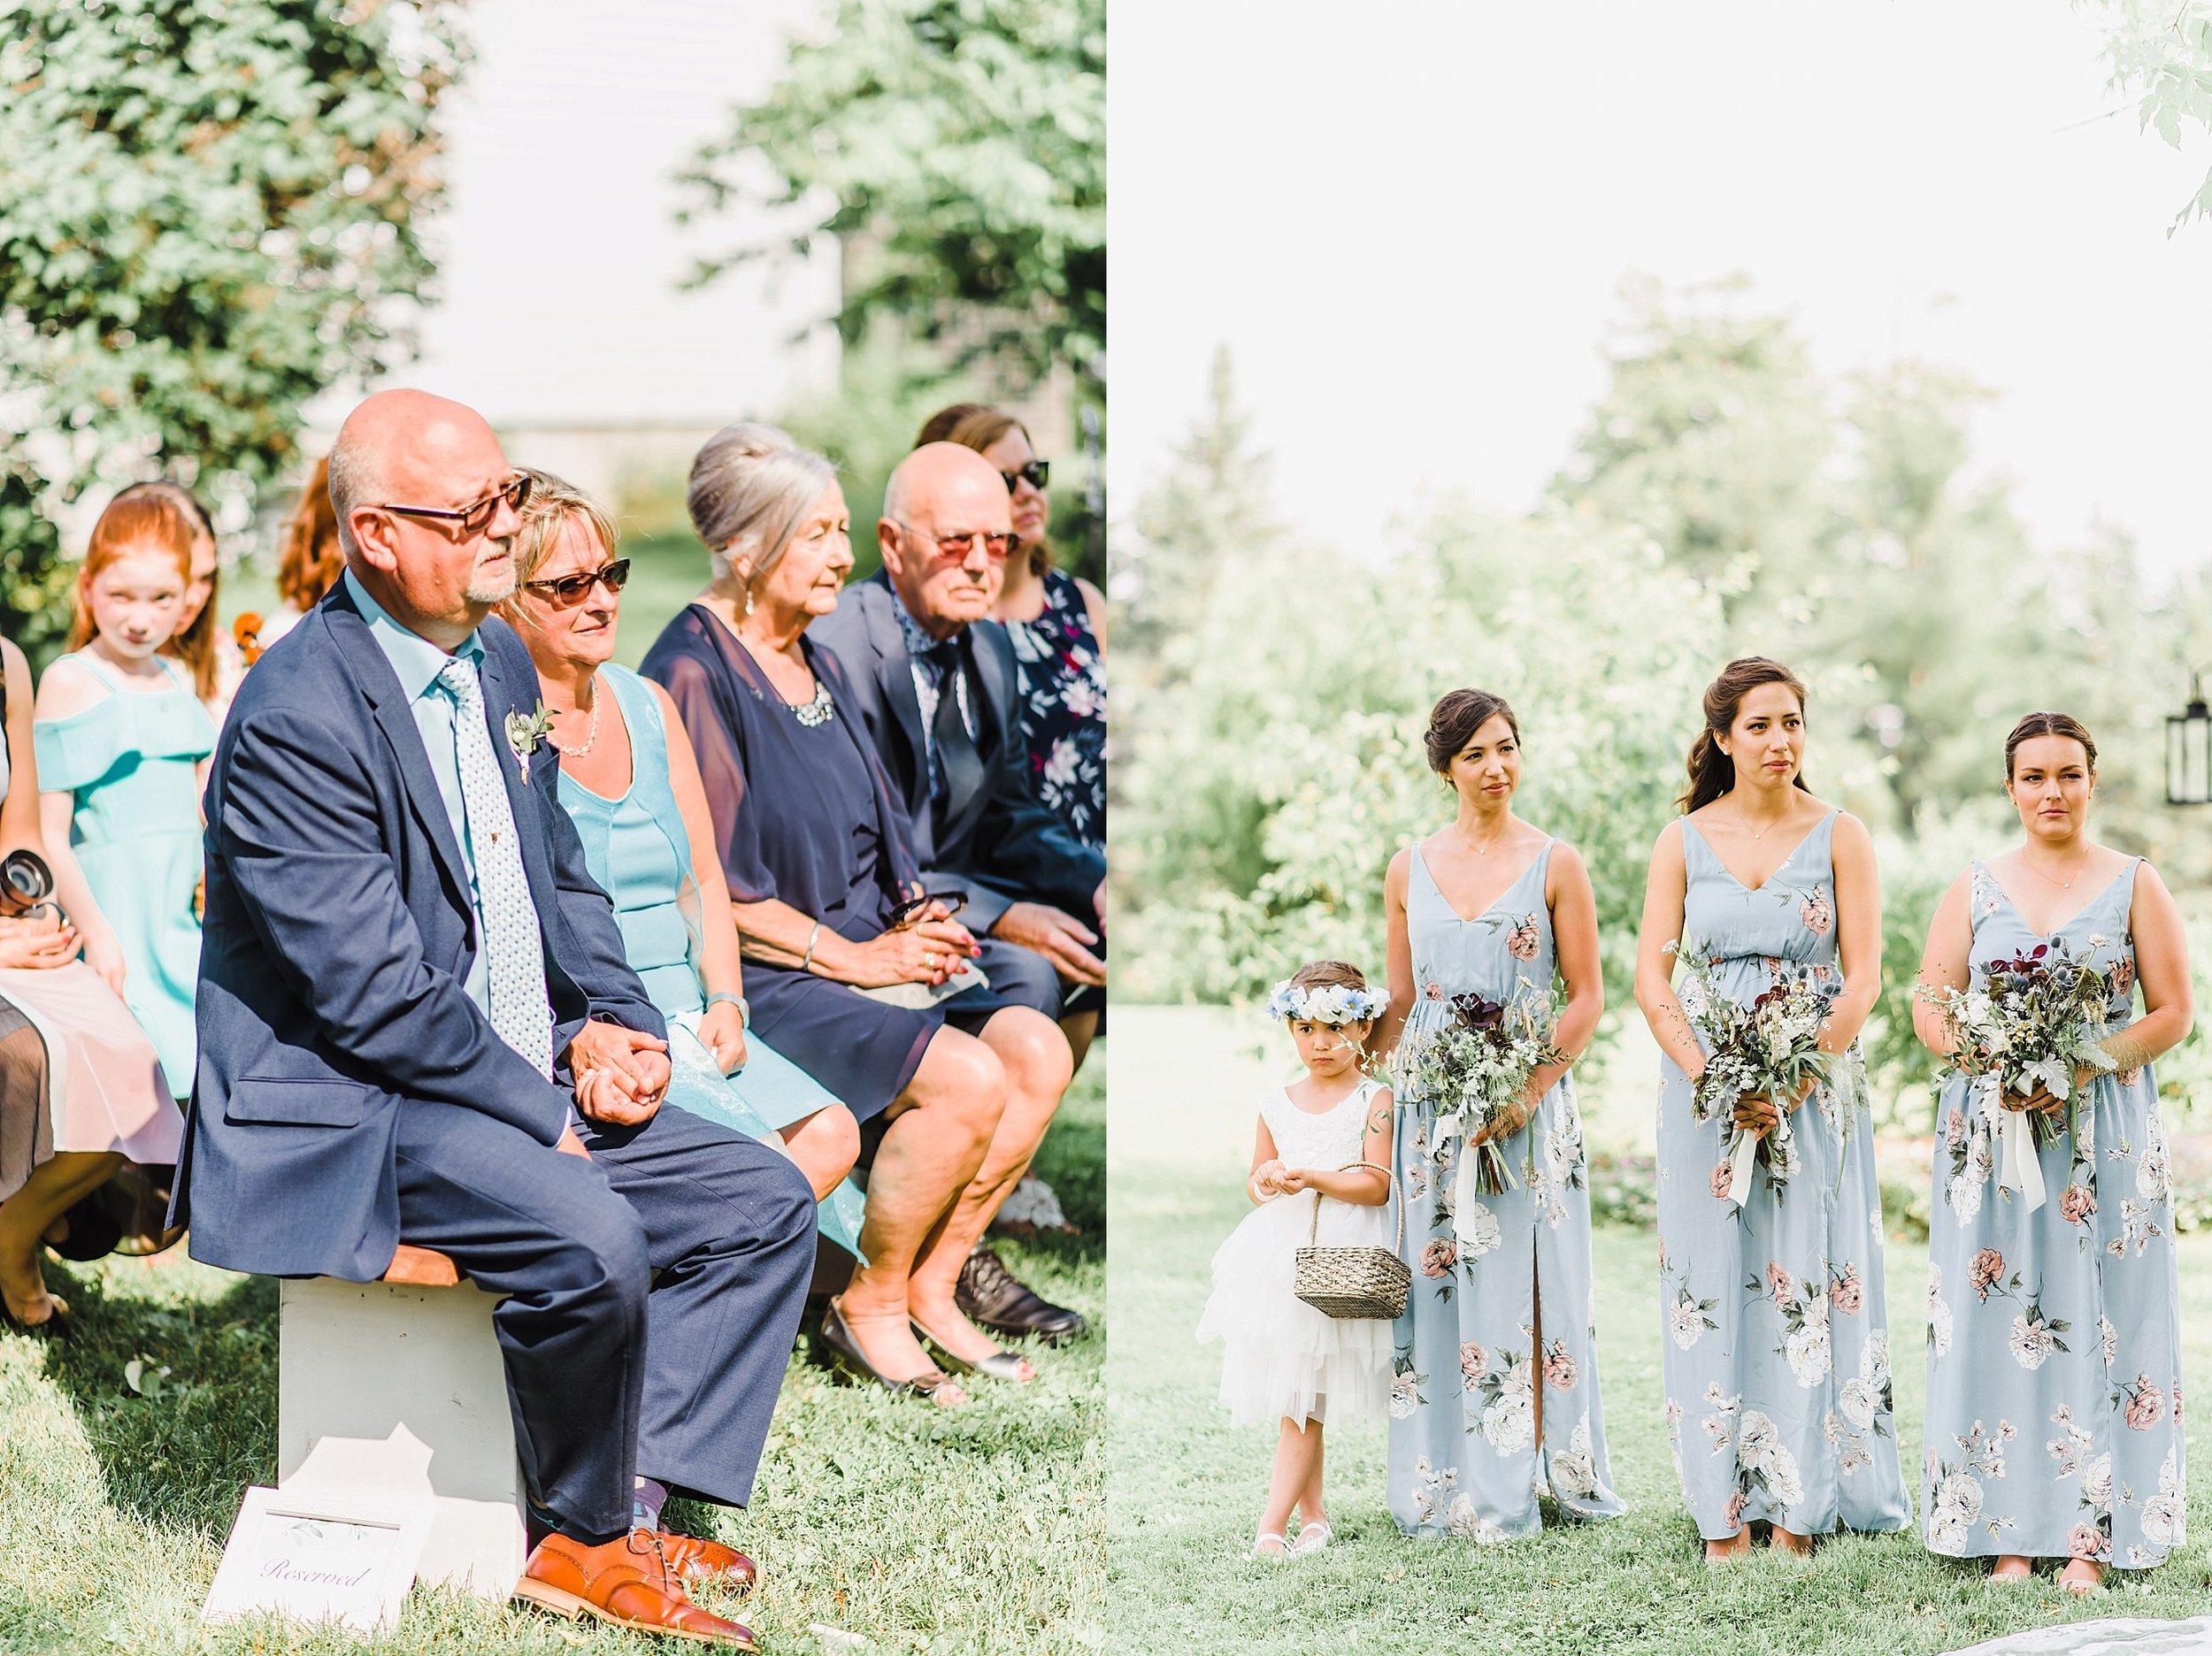 light airy indie fine art ottawa wedding photographer | Ali and Batoul Photography_0815.jpg